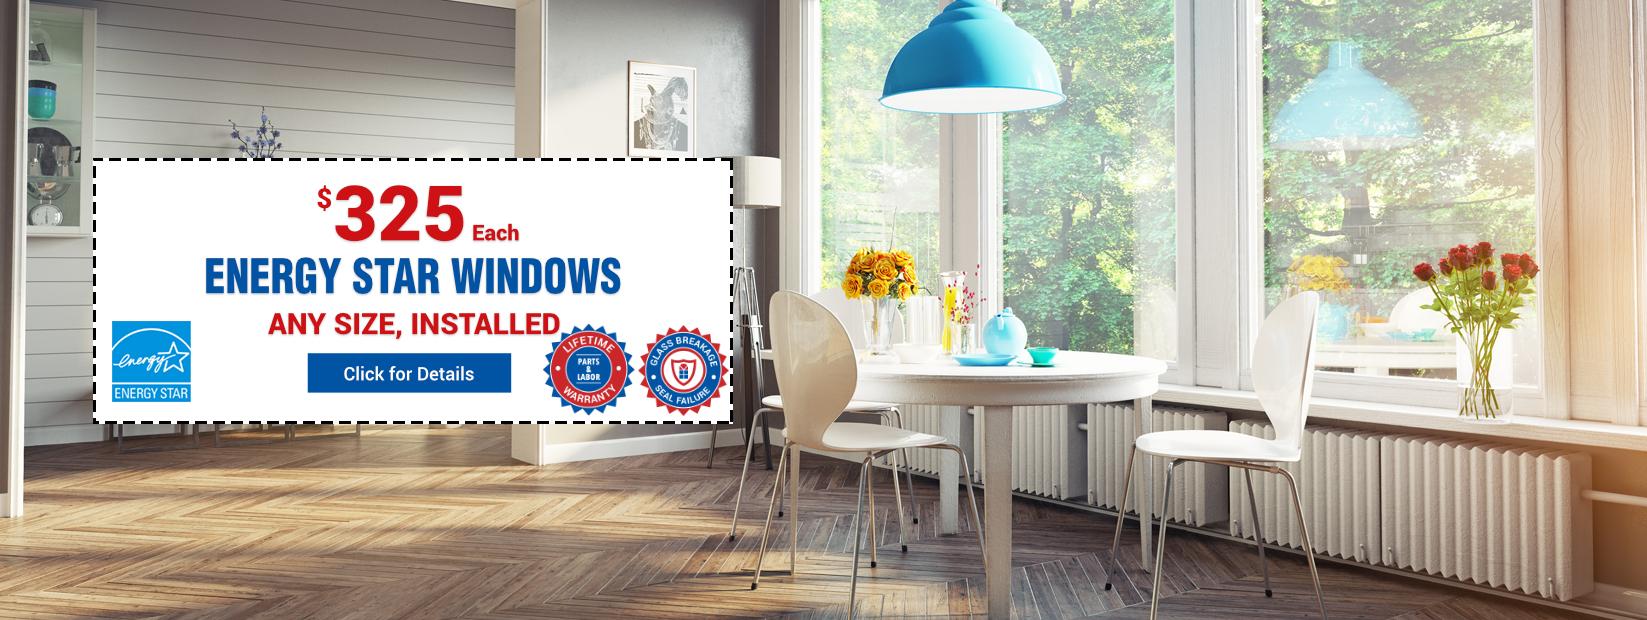 Energy Star Windows Installed